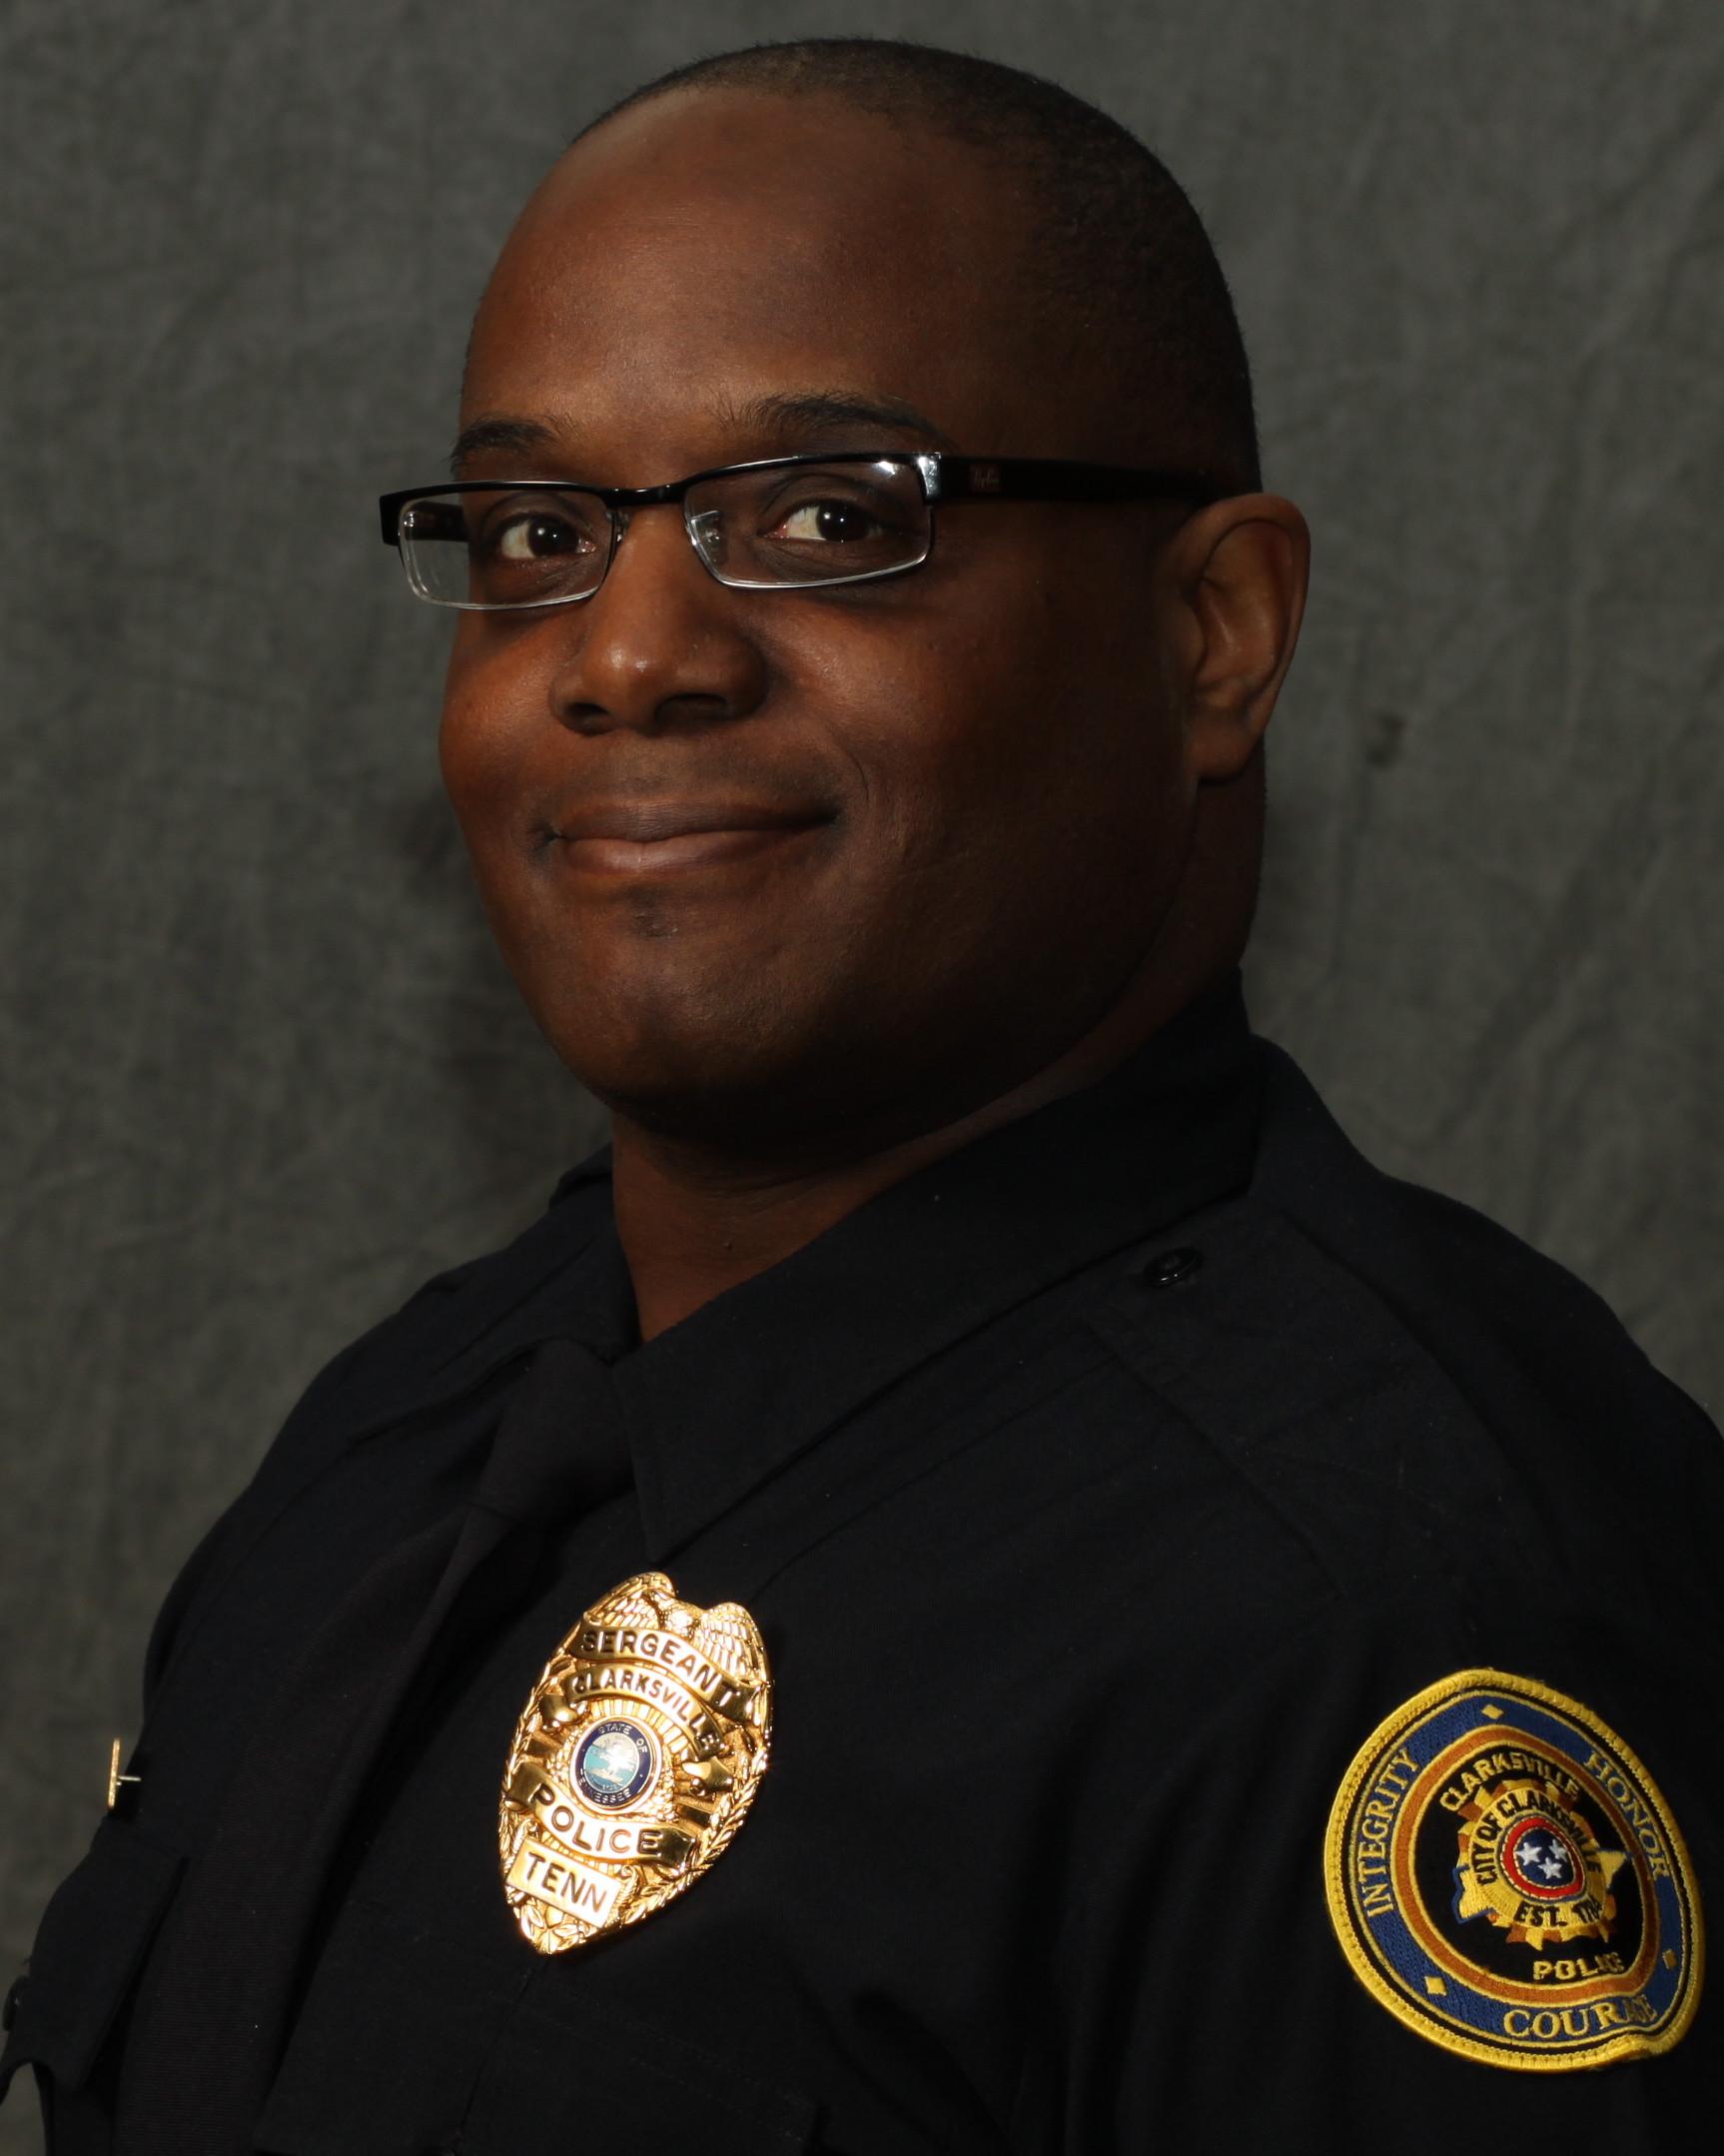 Sergeant David Miller | Clarksville Police Department, Tennessee